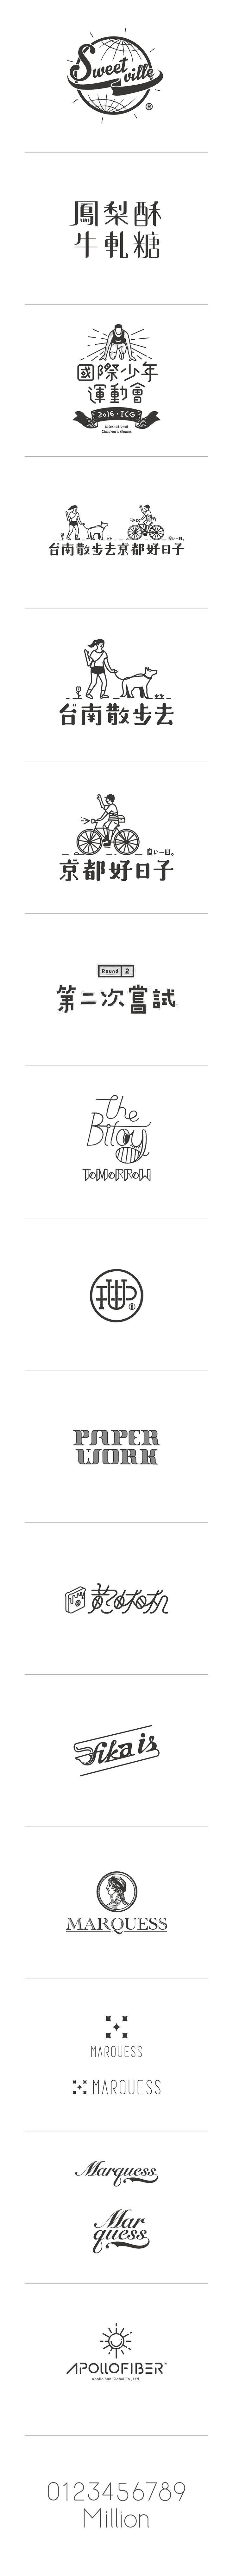 Logotype / 2 on Behance